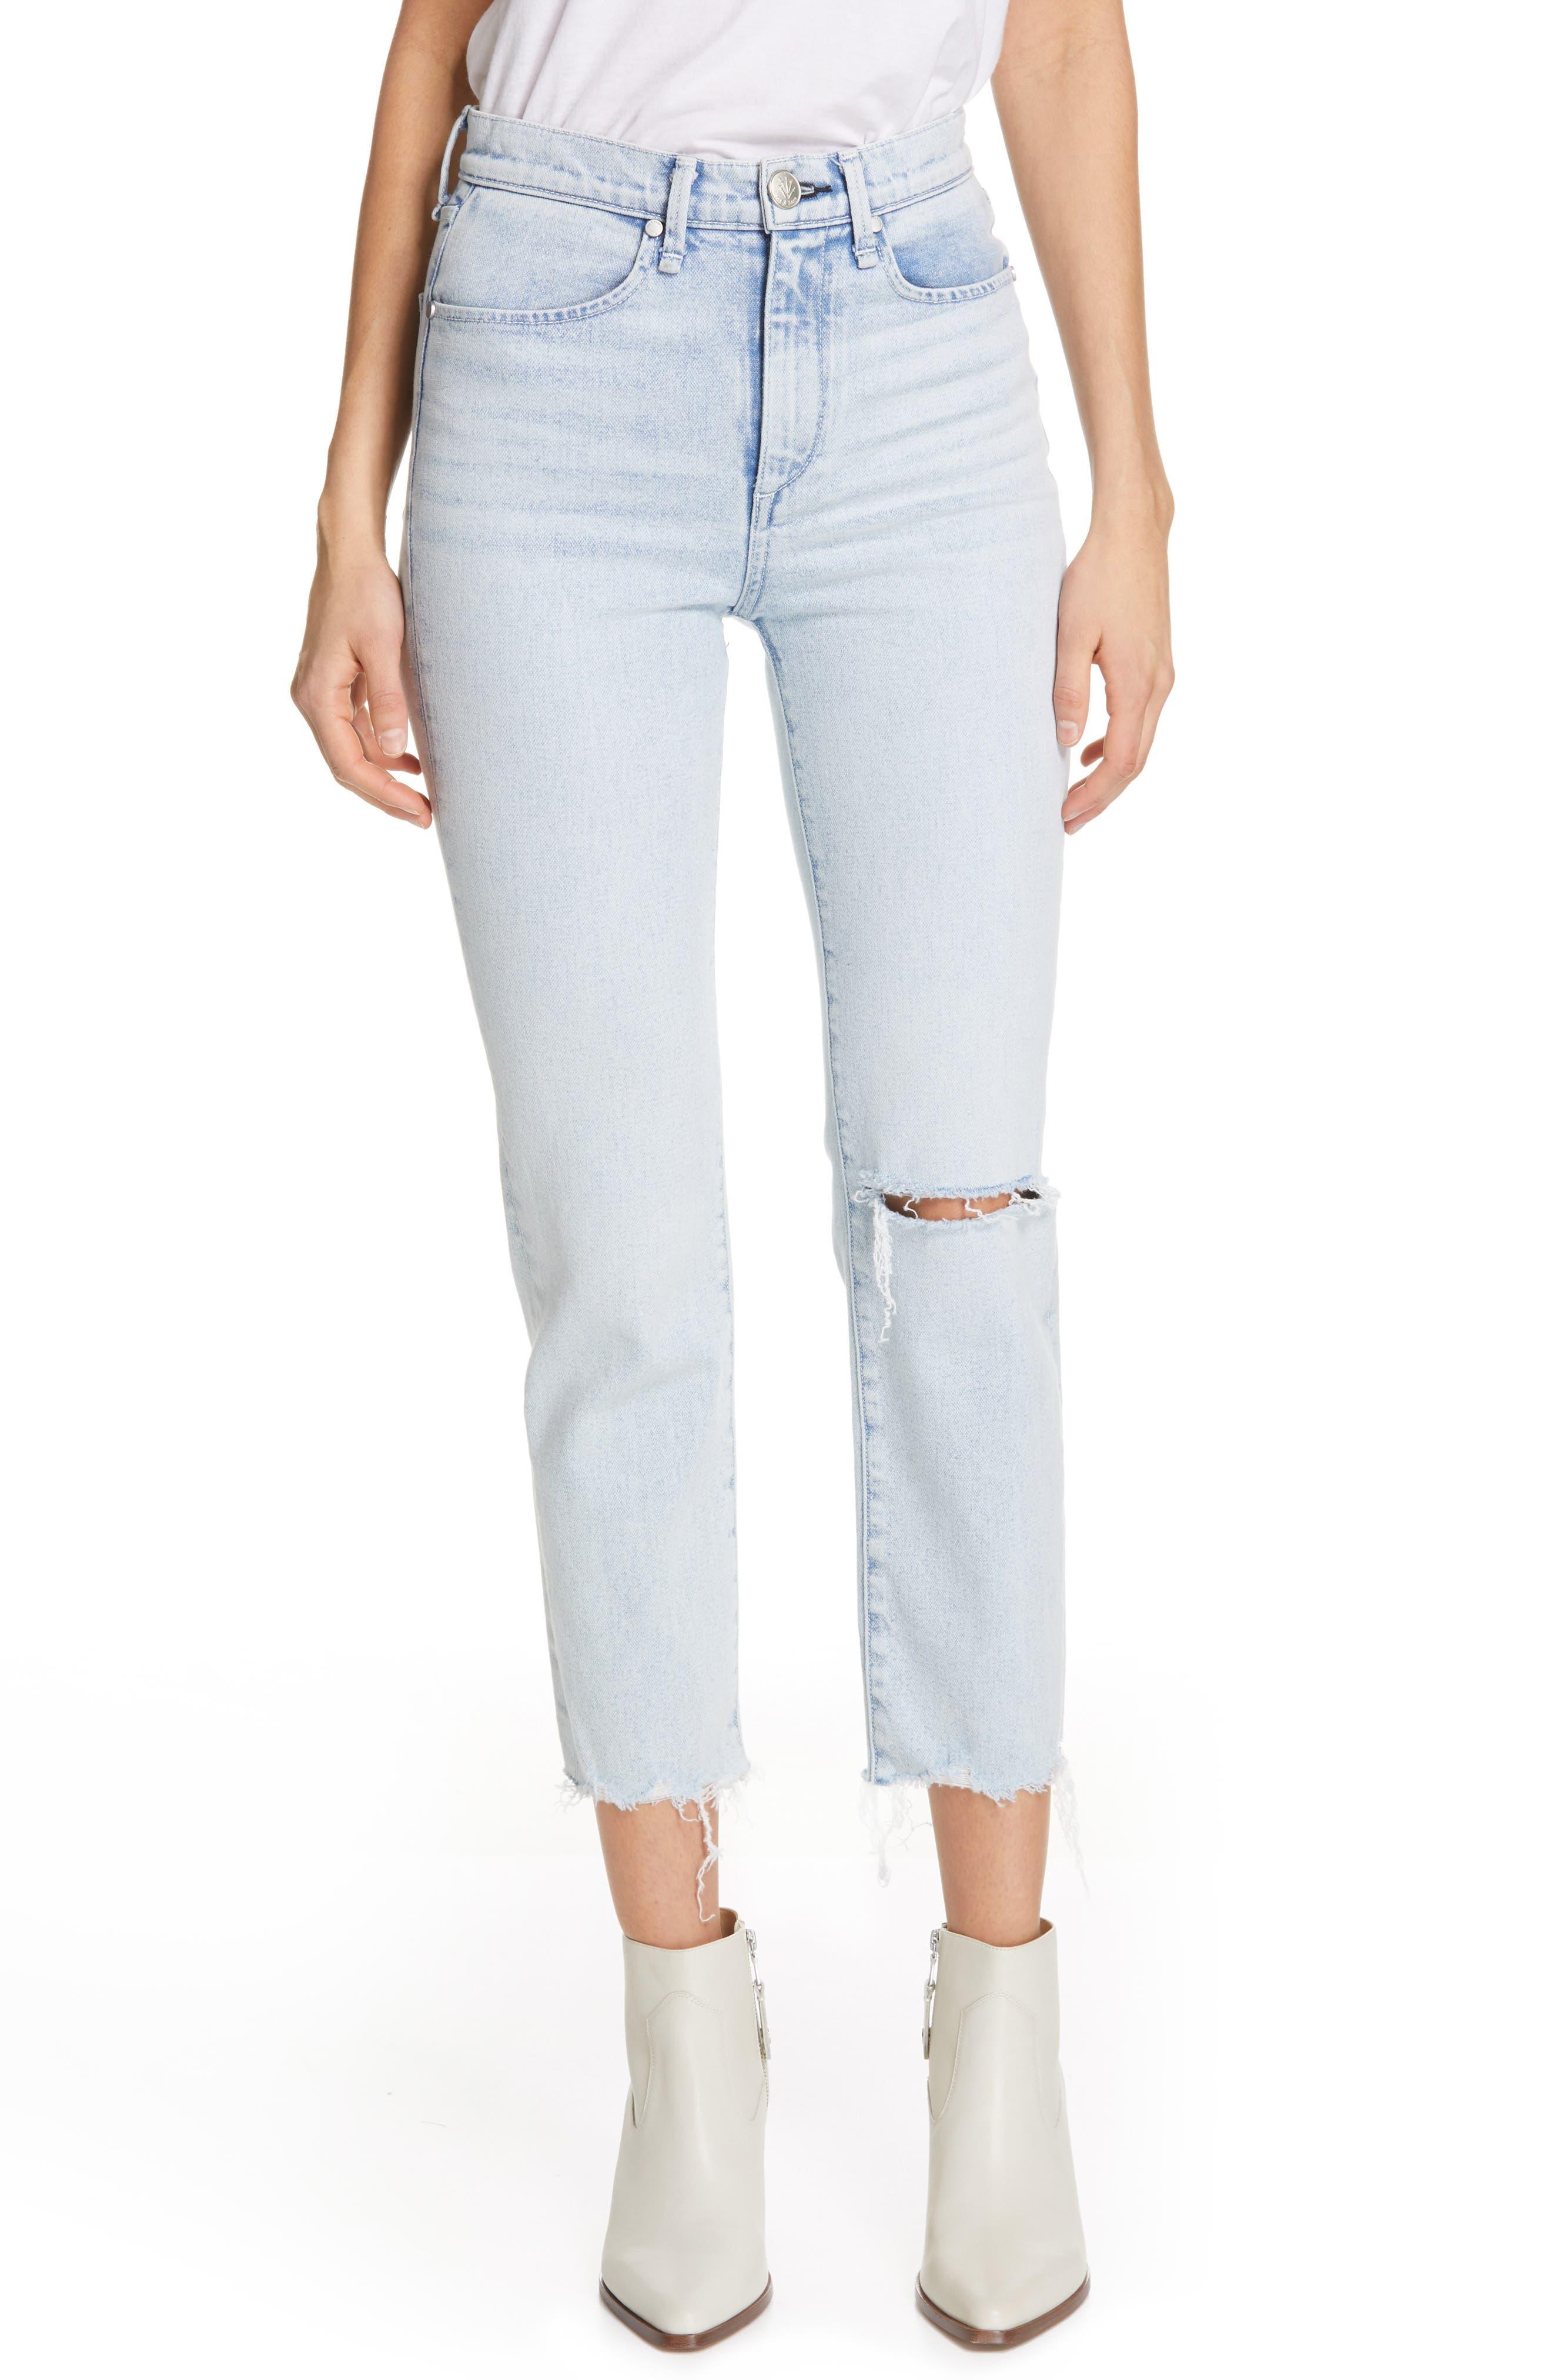 RAG & BONE JEAN High Waist Ripped Ankle Cigarette Jeans, Main, color, 450